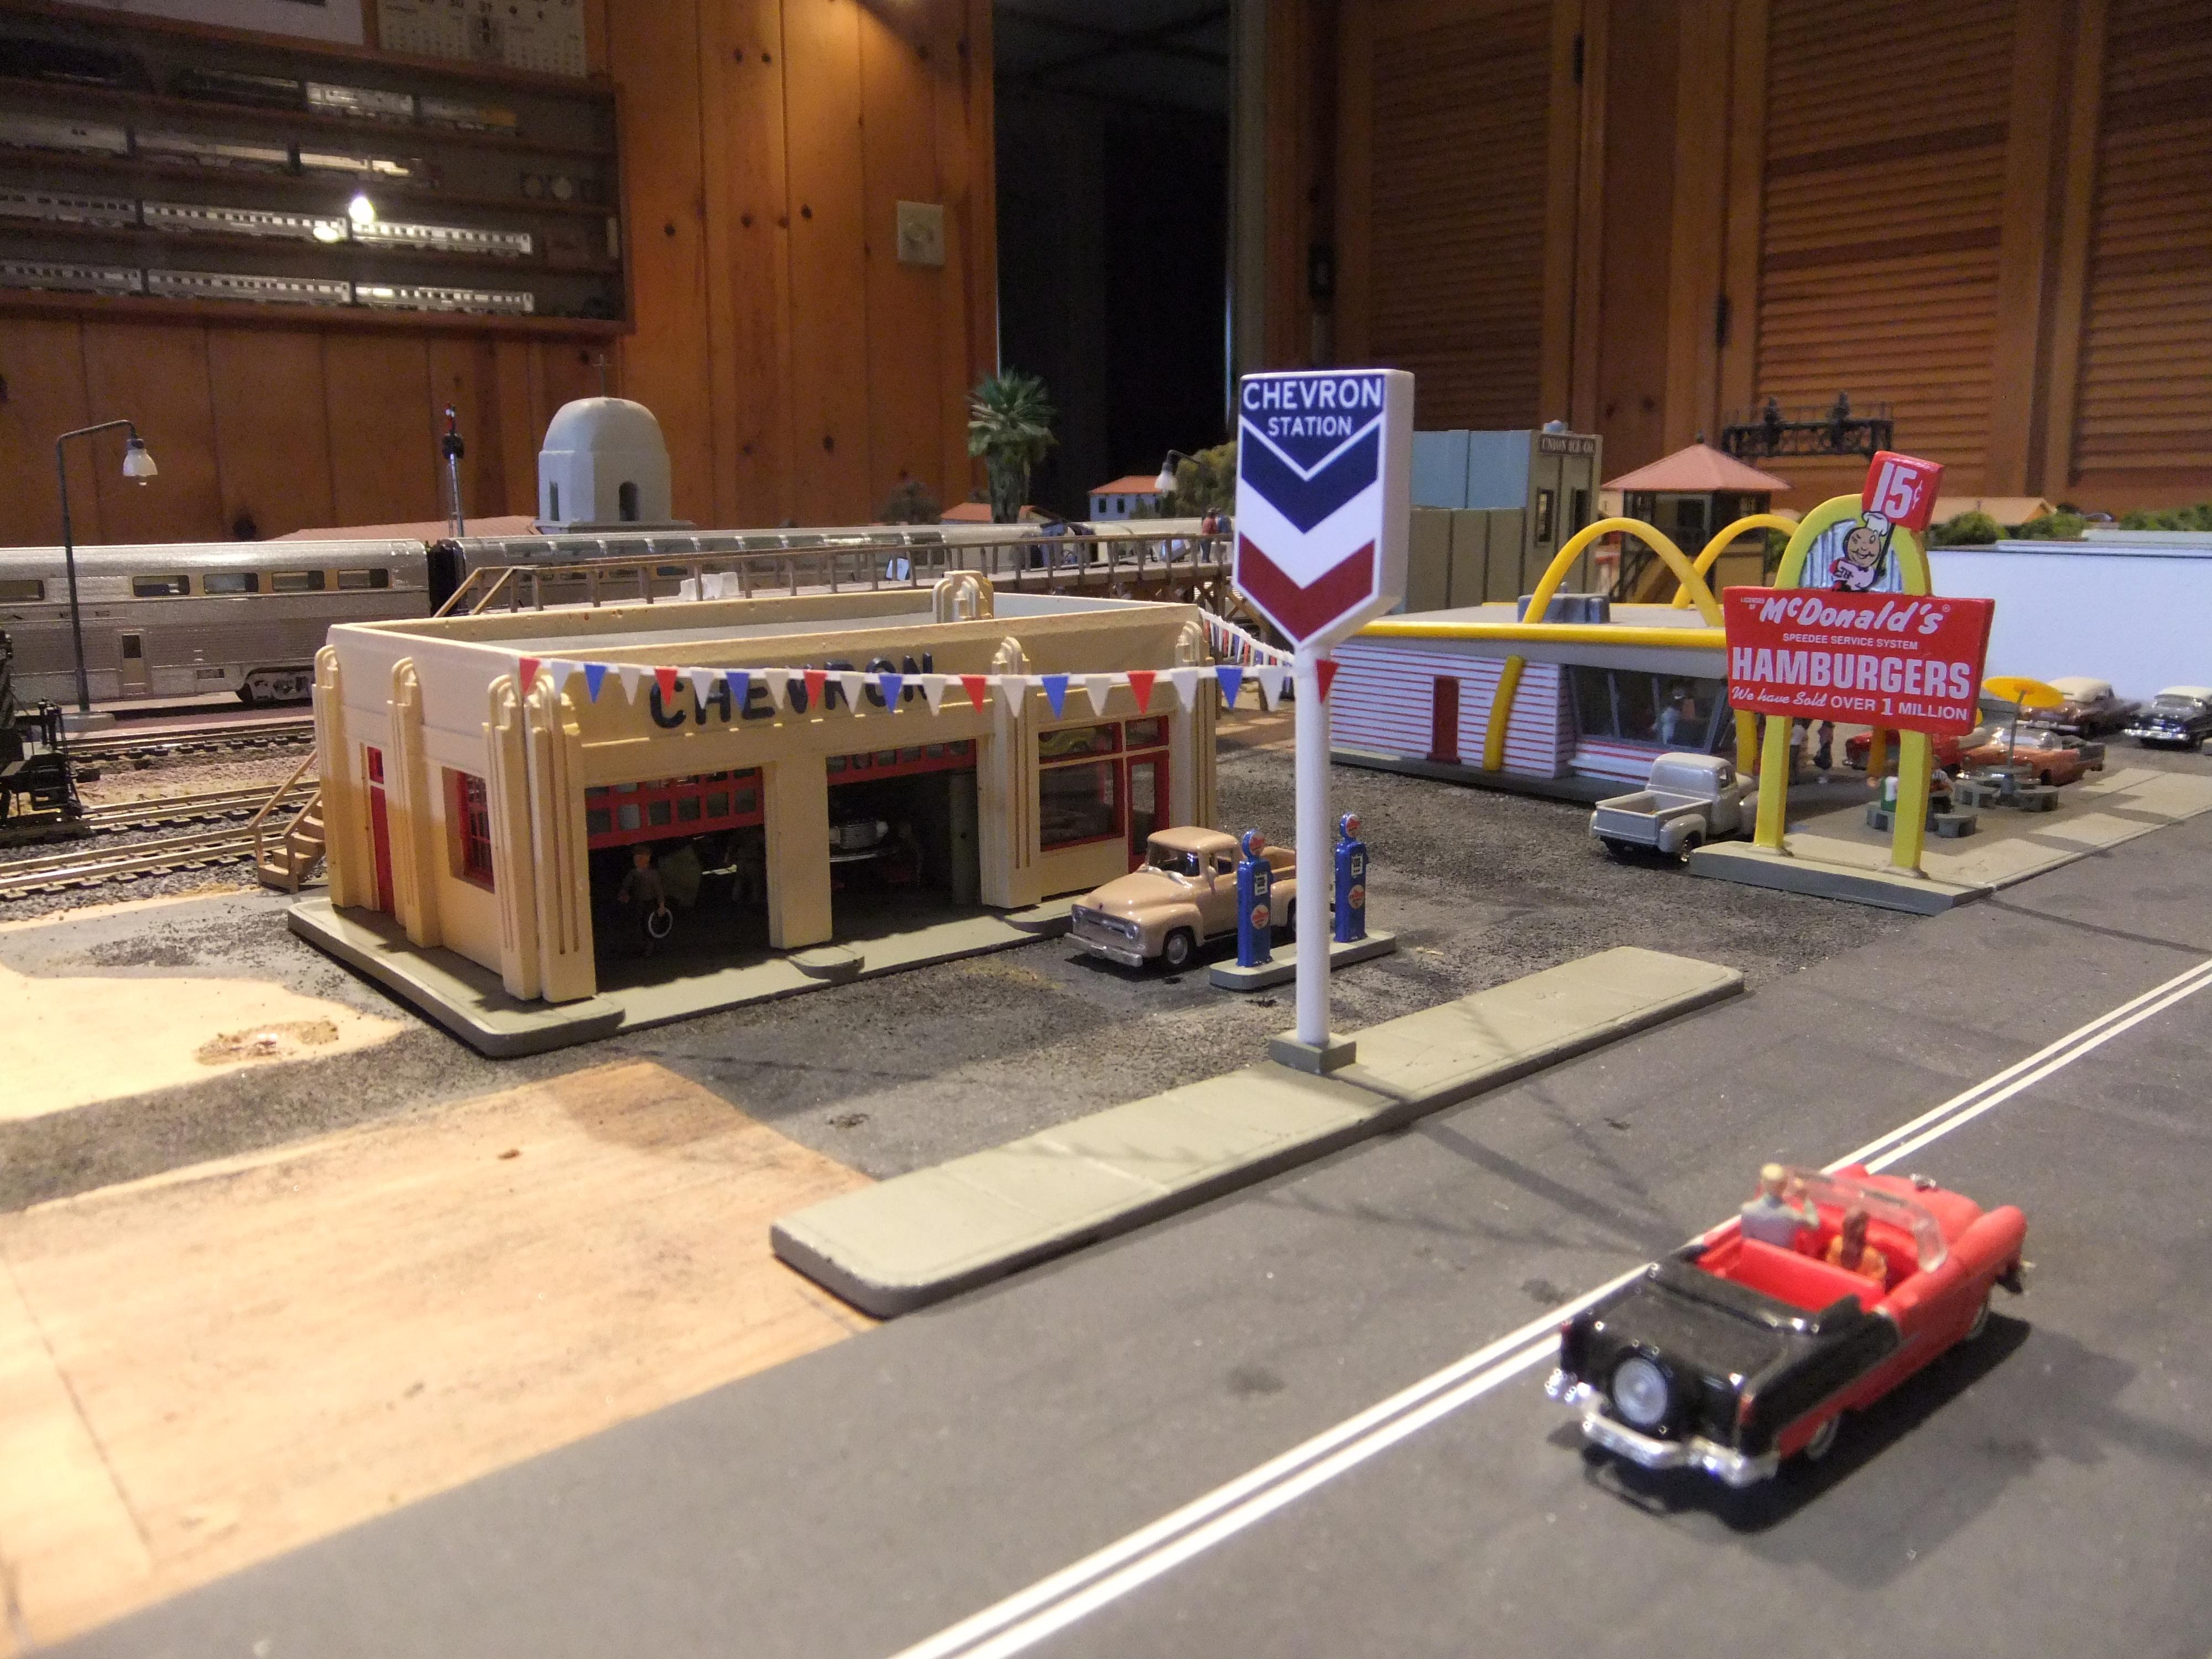 Chevron Station 1 by SouthwestChief